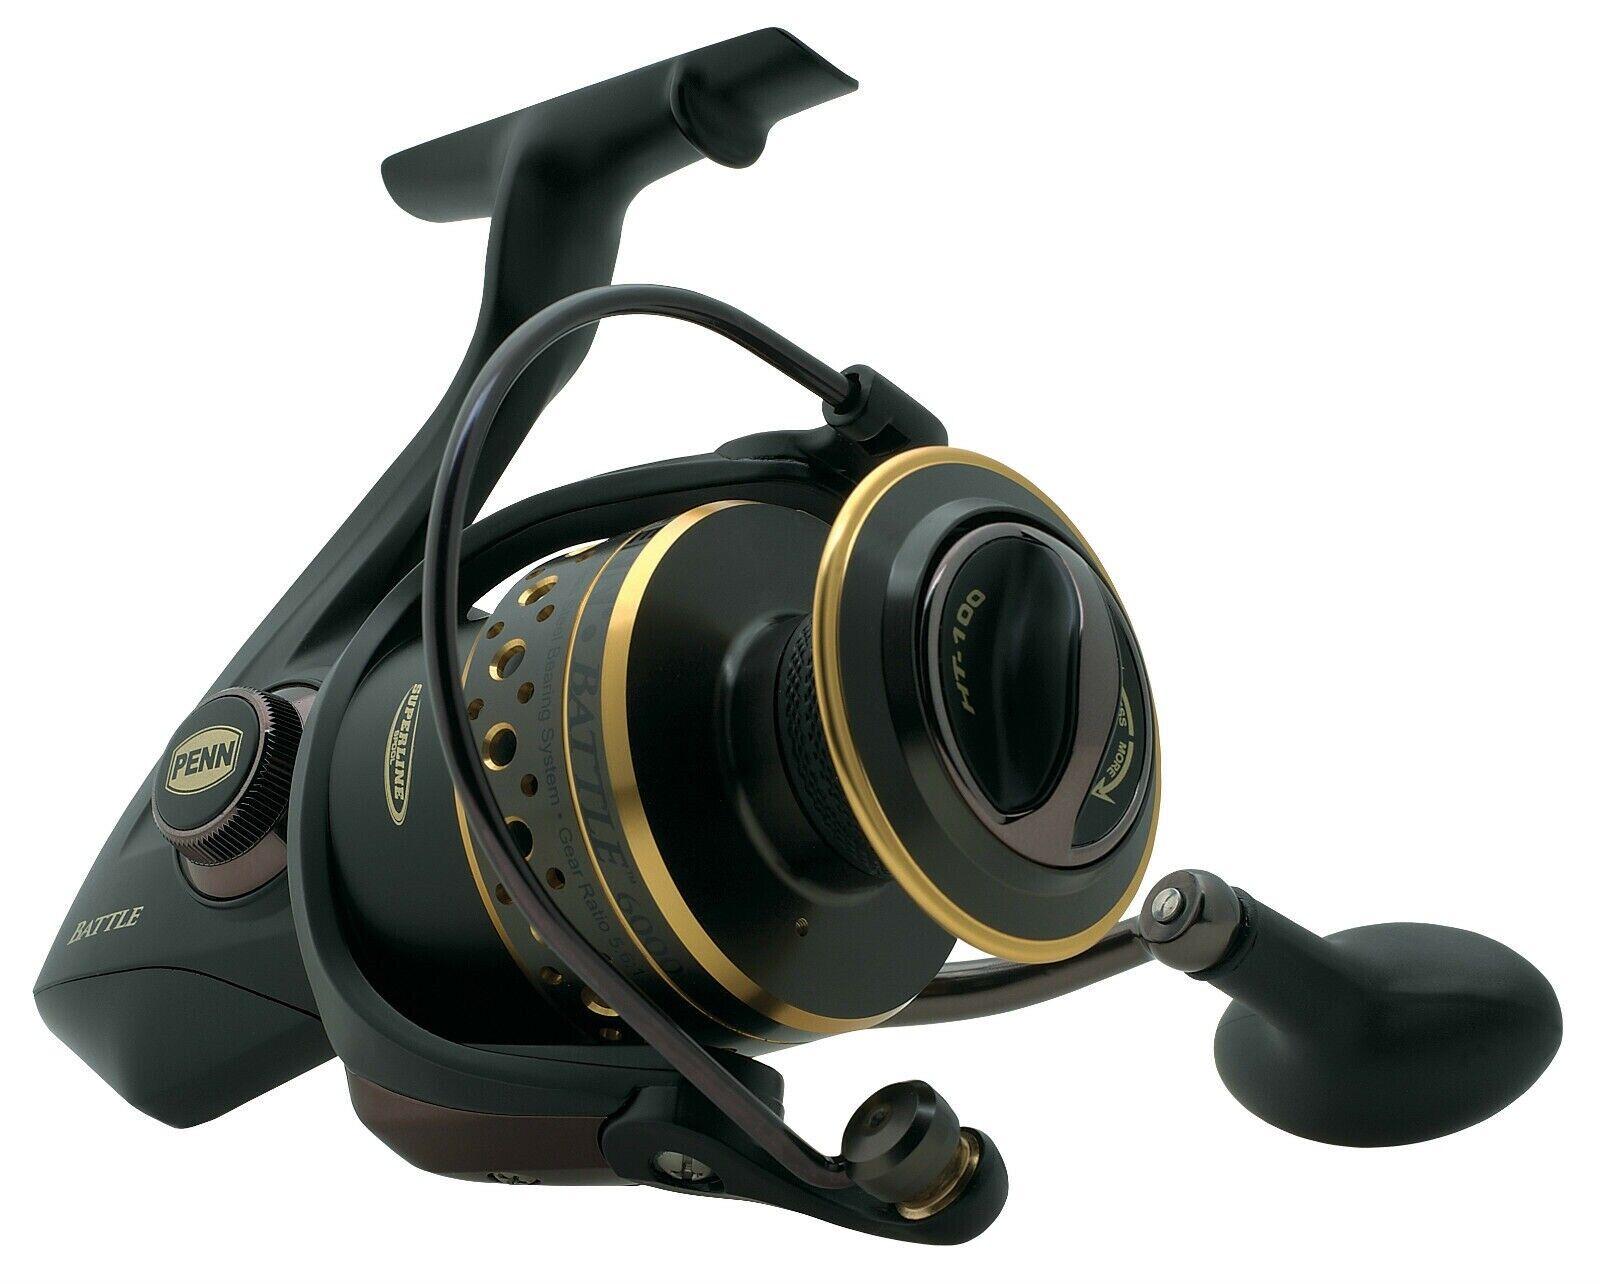 Penn battle 200 Spinning   Spin Fishing Reel Ersatz Löffel L6